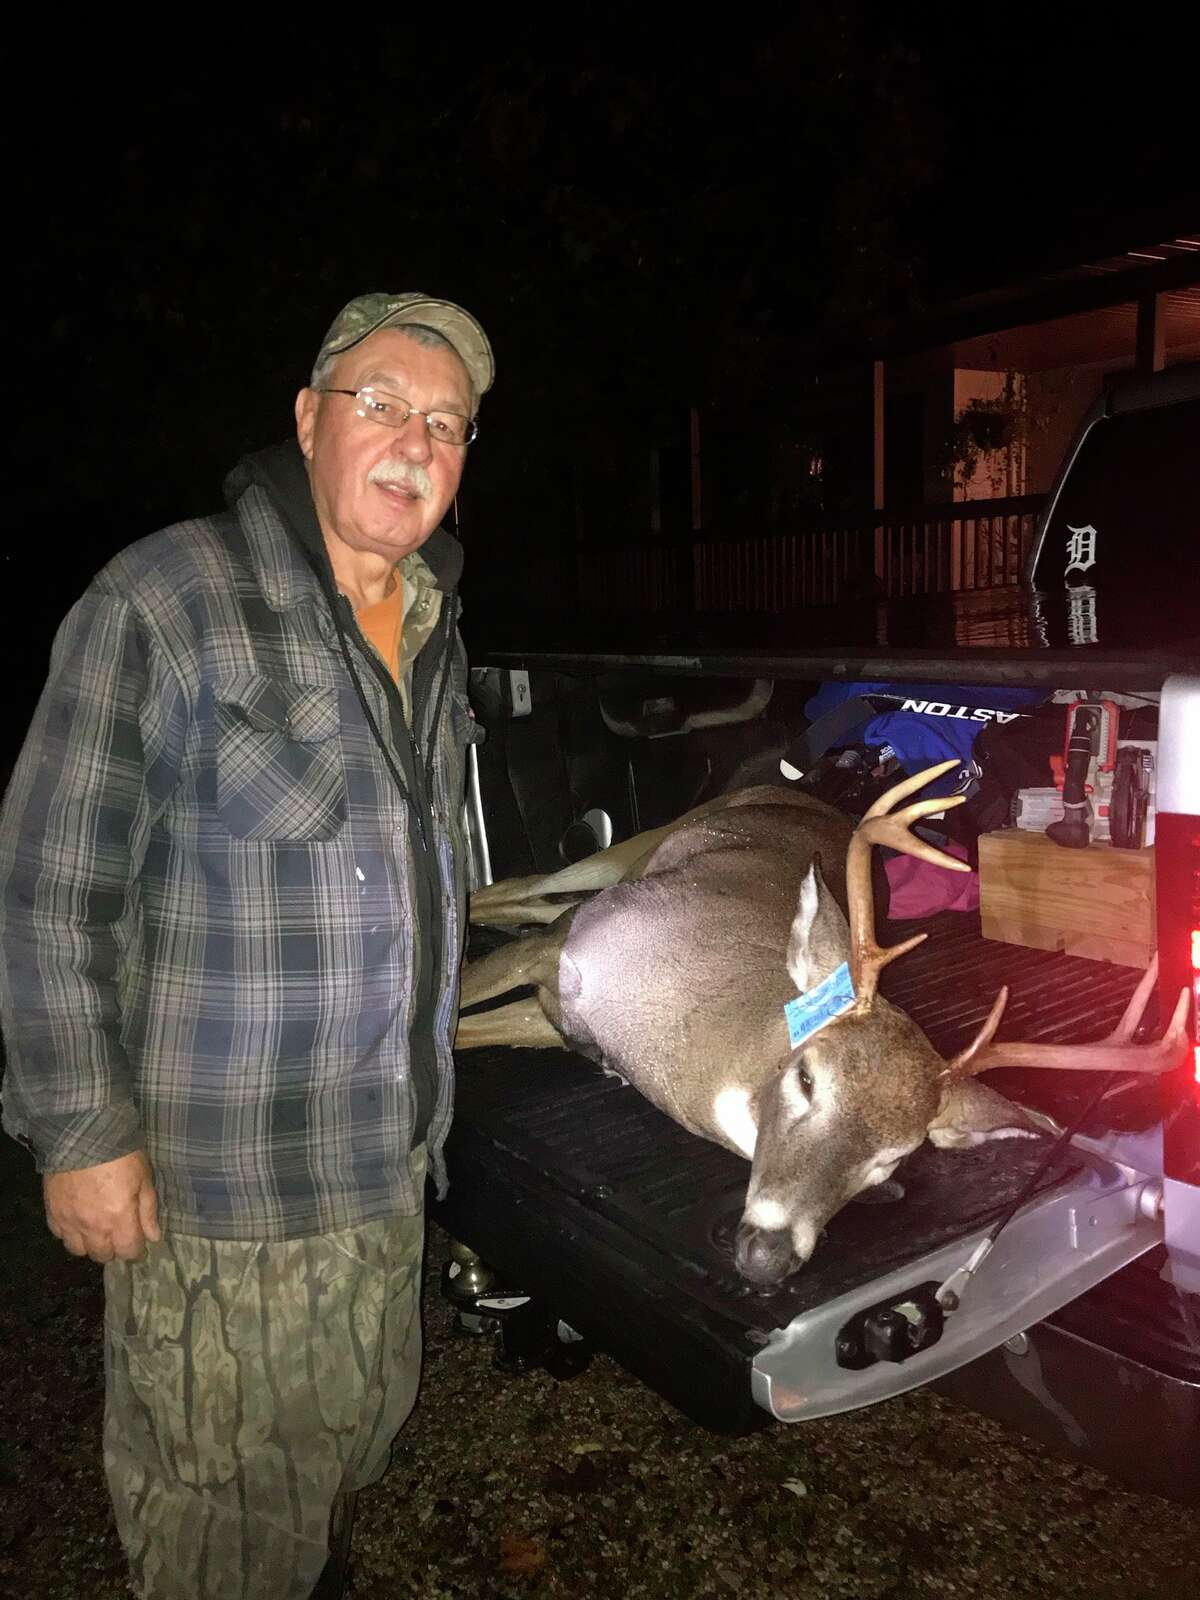 Big Rapids' Paul Cole is among the area's most avid deer hunters.